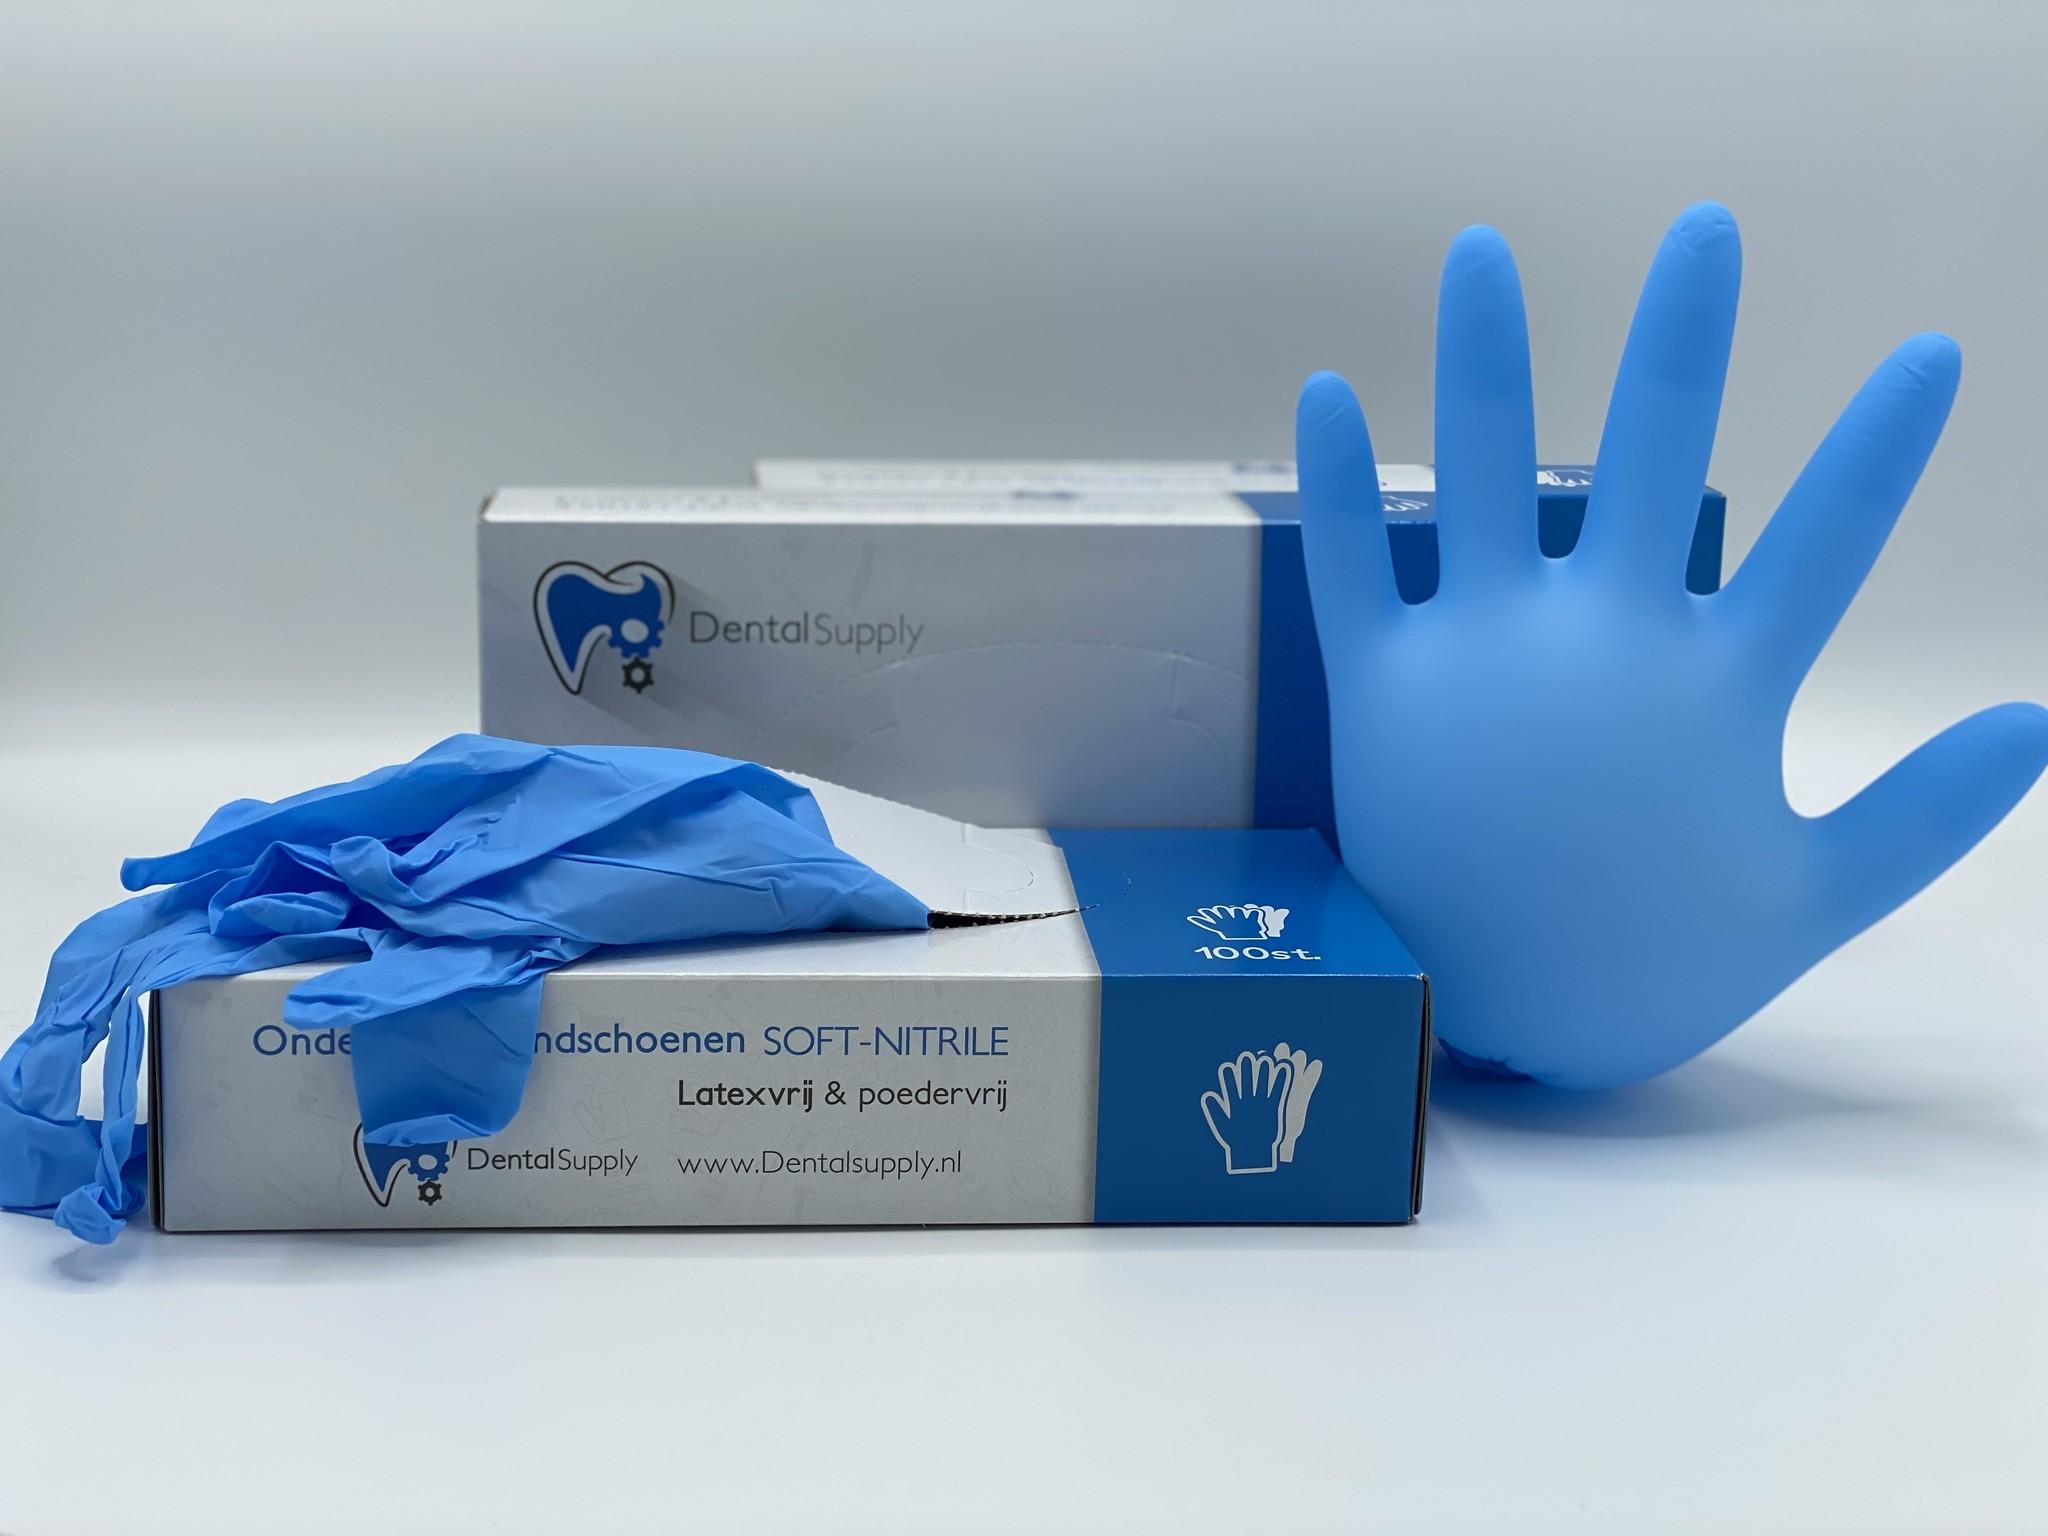 Handschoen Soft Nitrile PF, volledige certificering - small 100 stuks